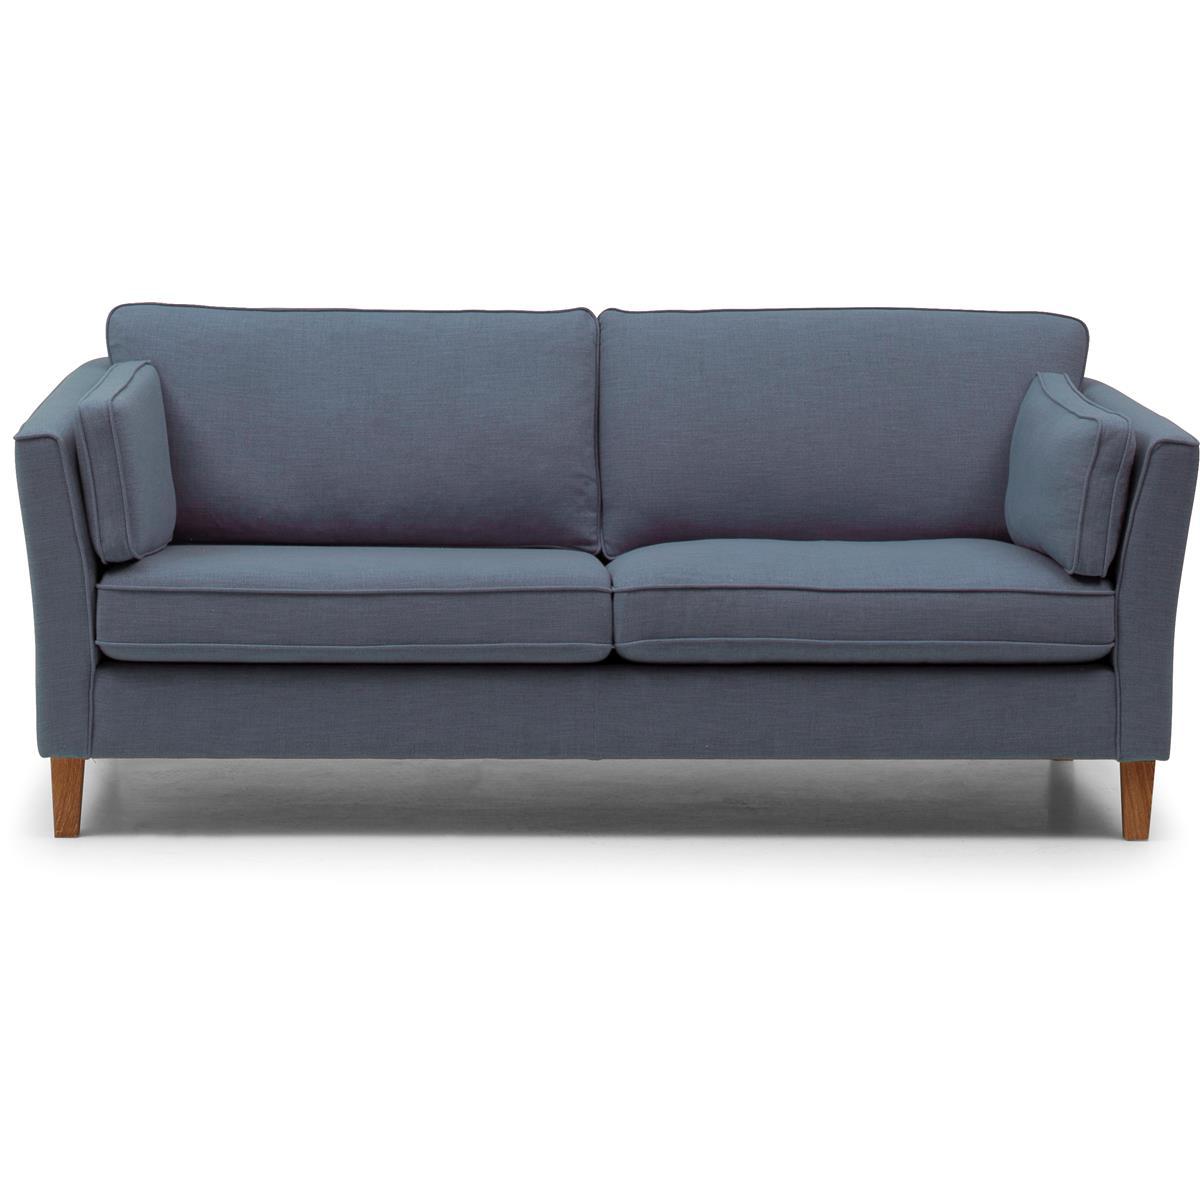 Carisma-soffa-3-sits-tyg-nordic-färg2-b